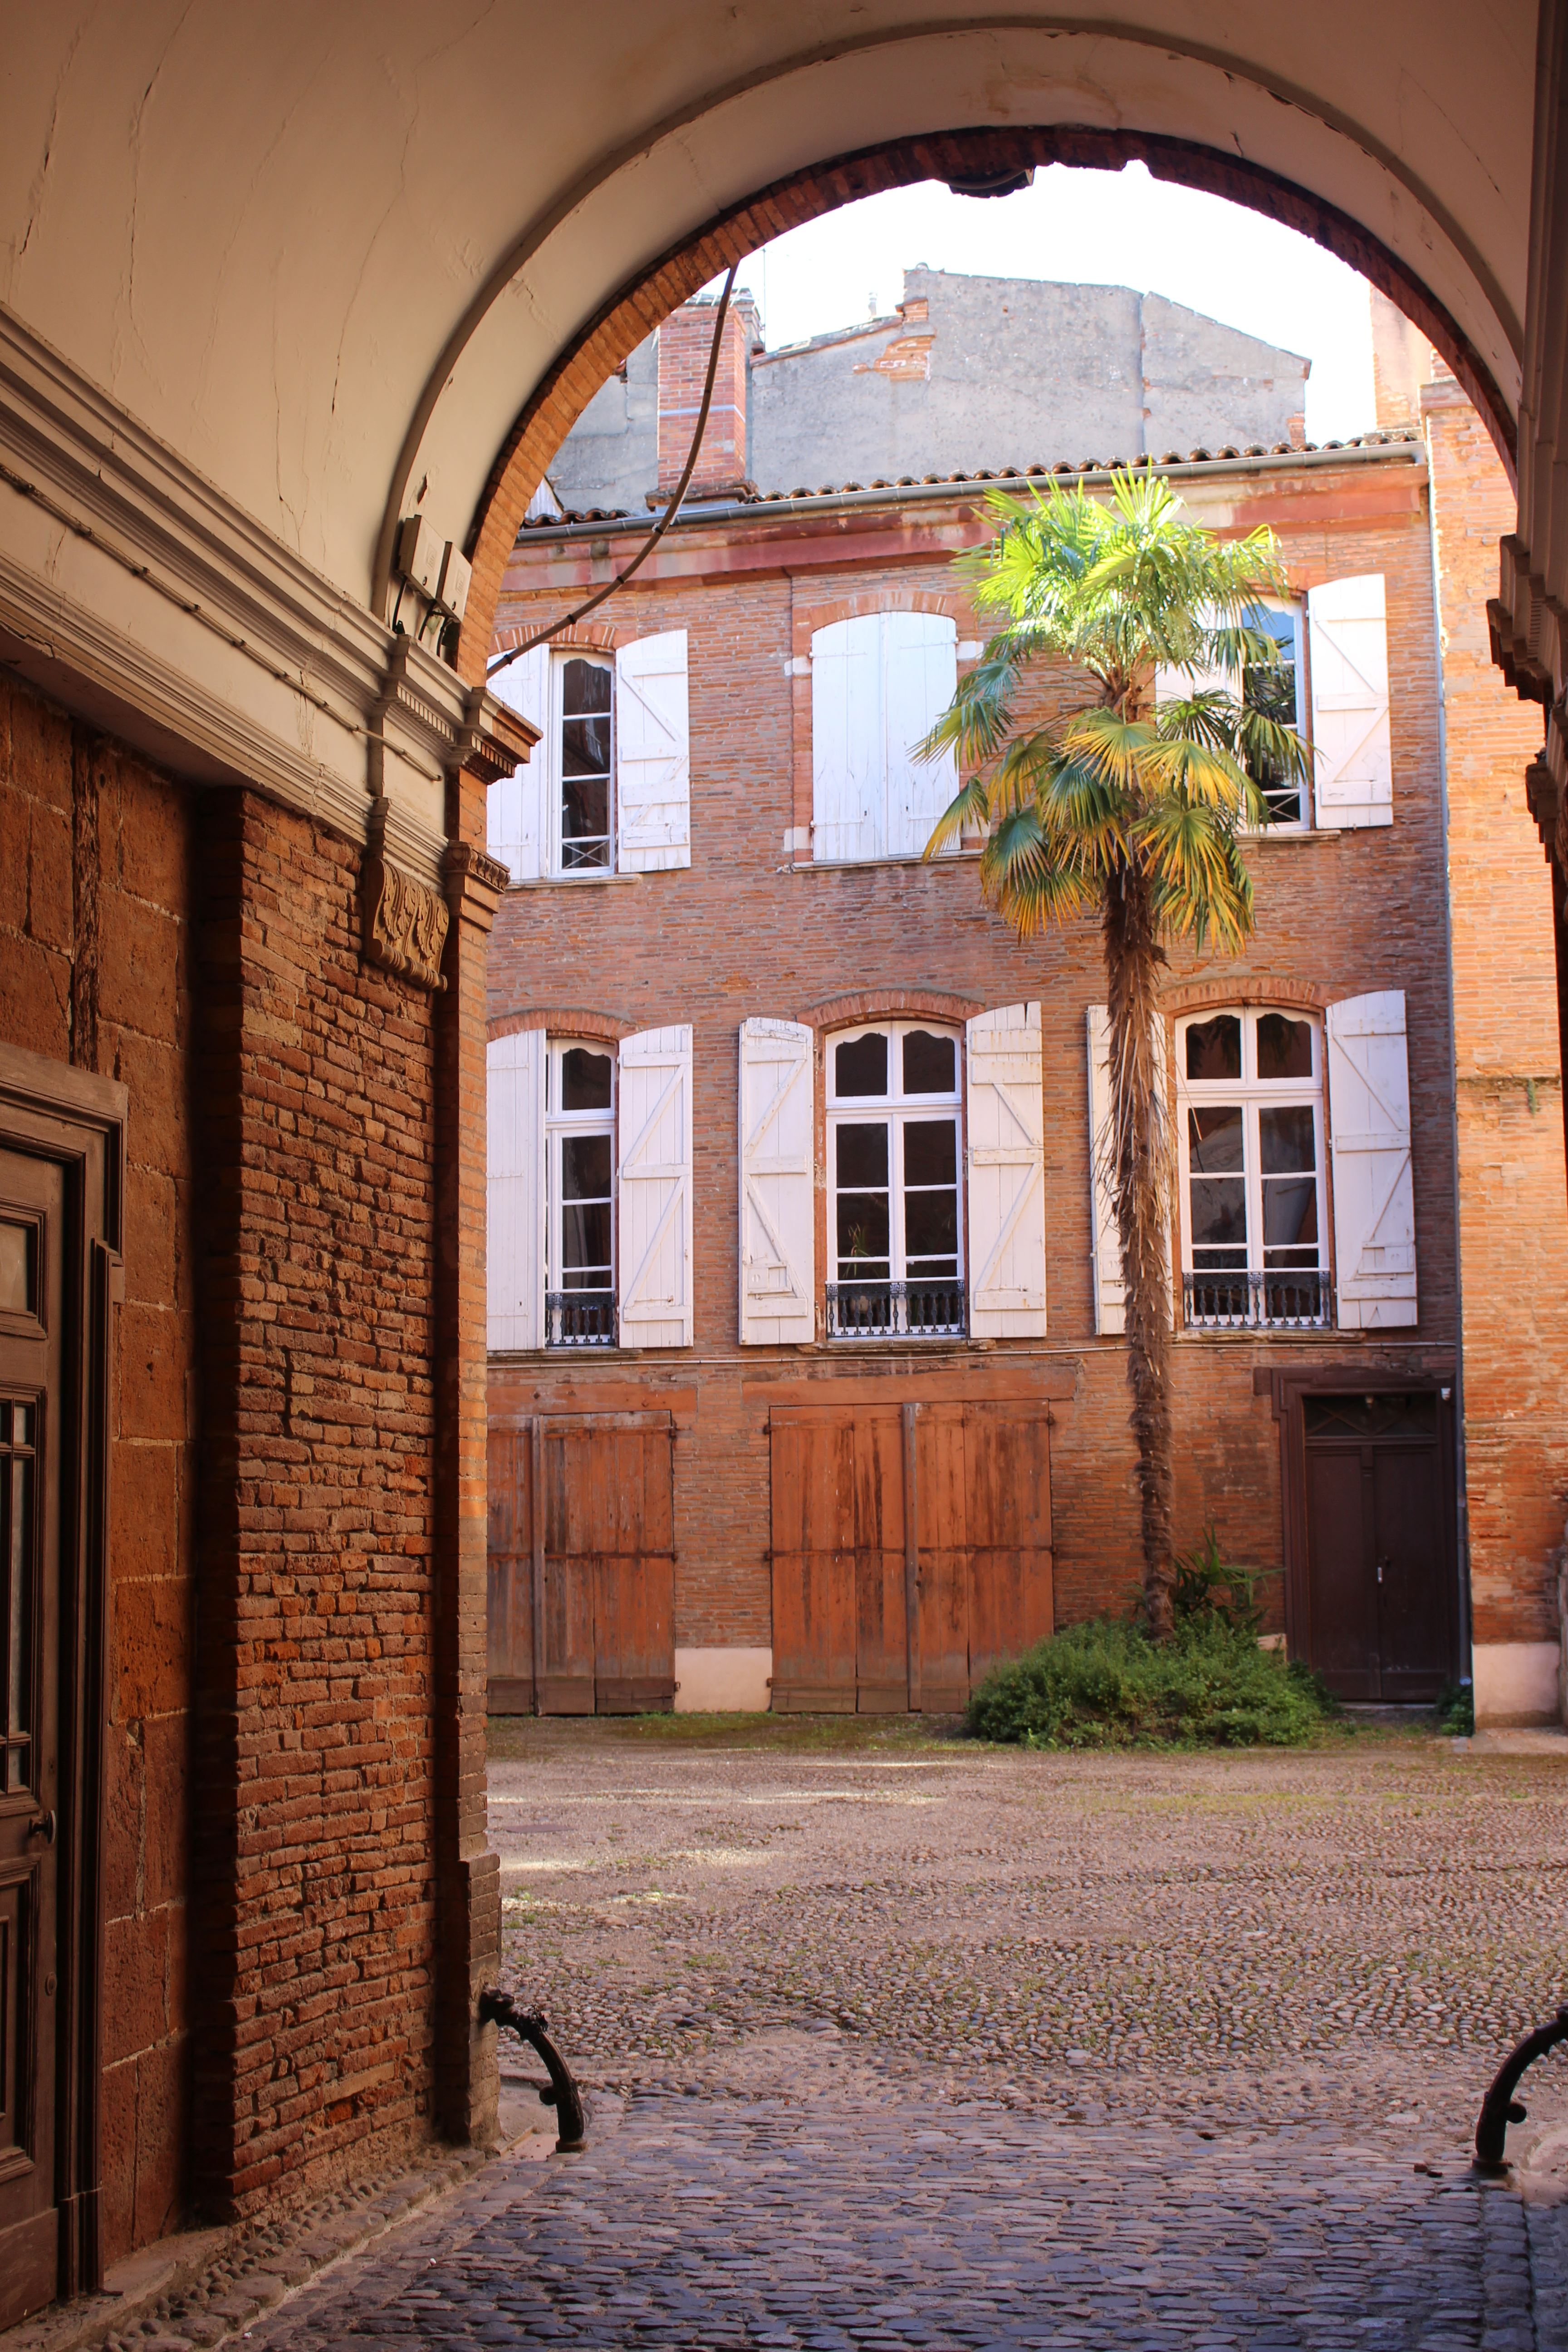 Toulouse's enigmatic quest